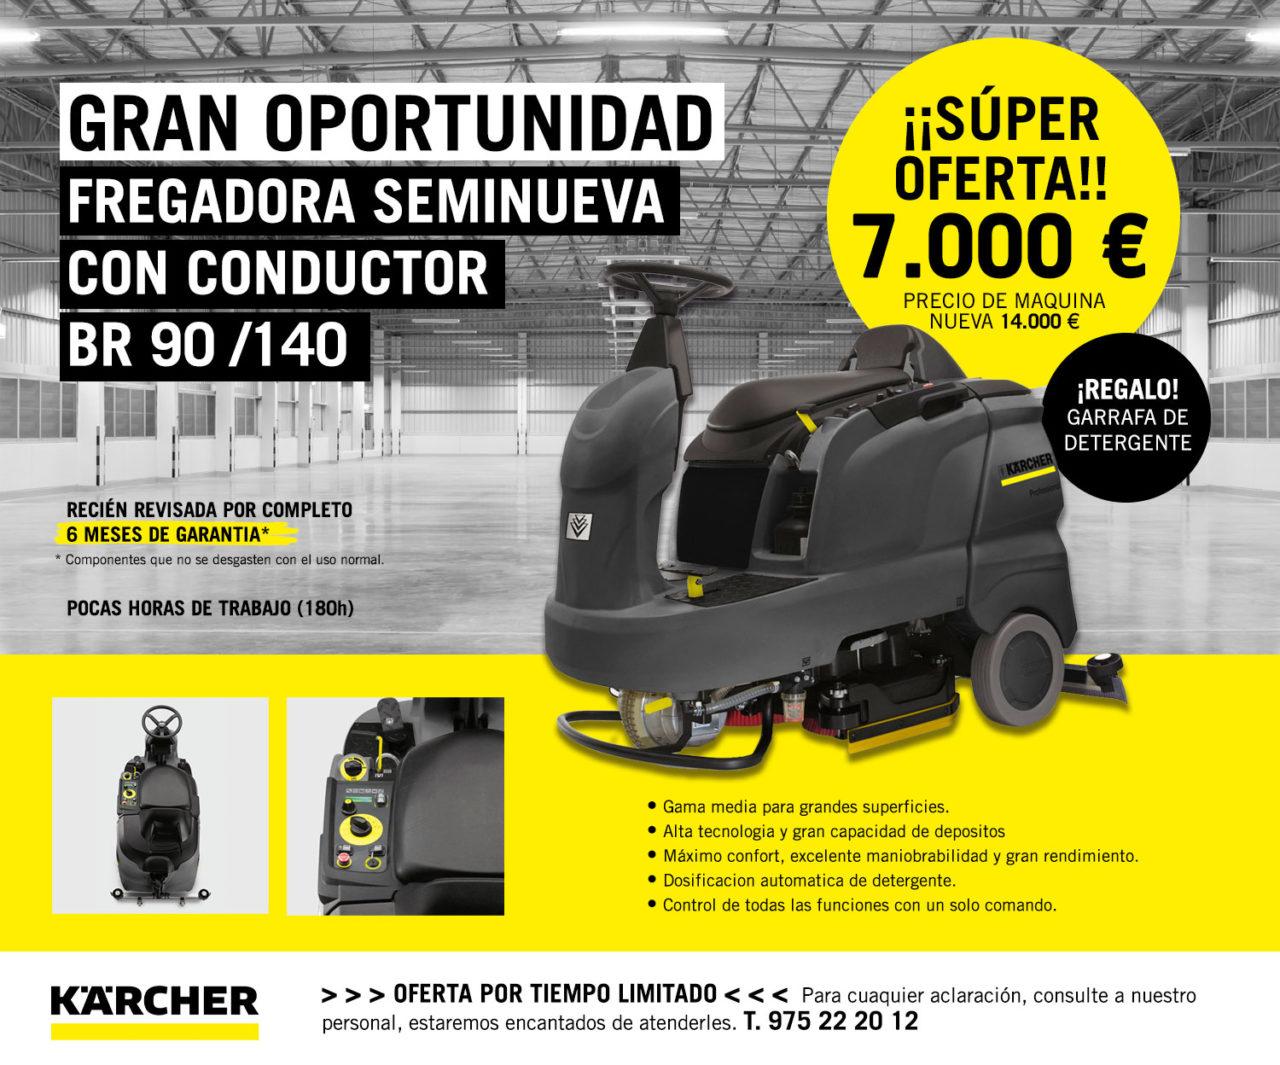 oferta-fregadora-karcher-1280x1065.jpg